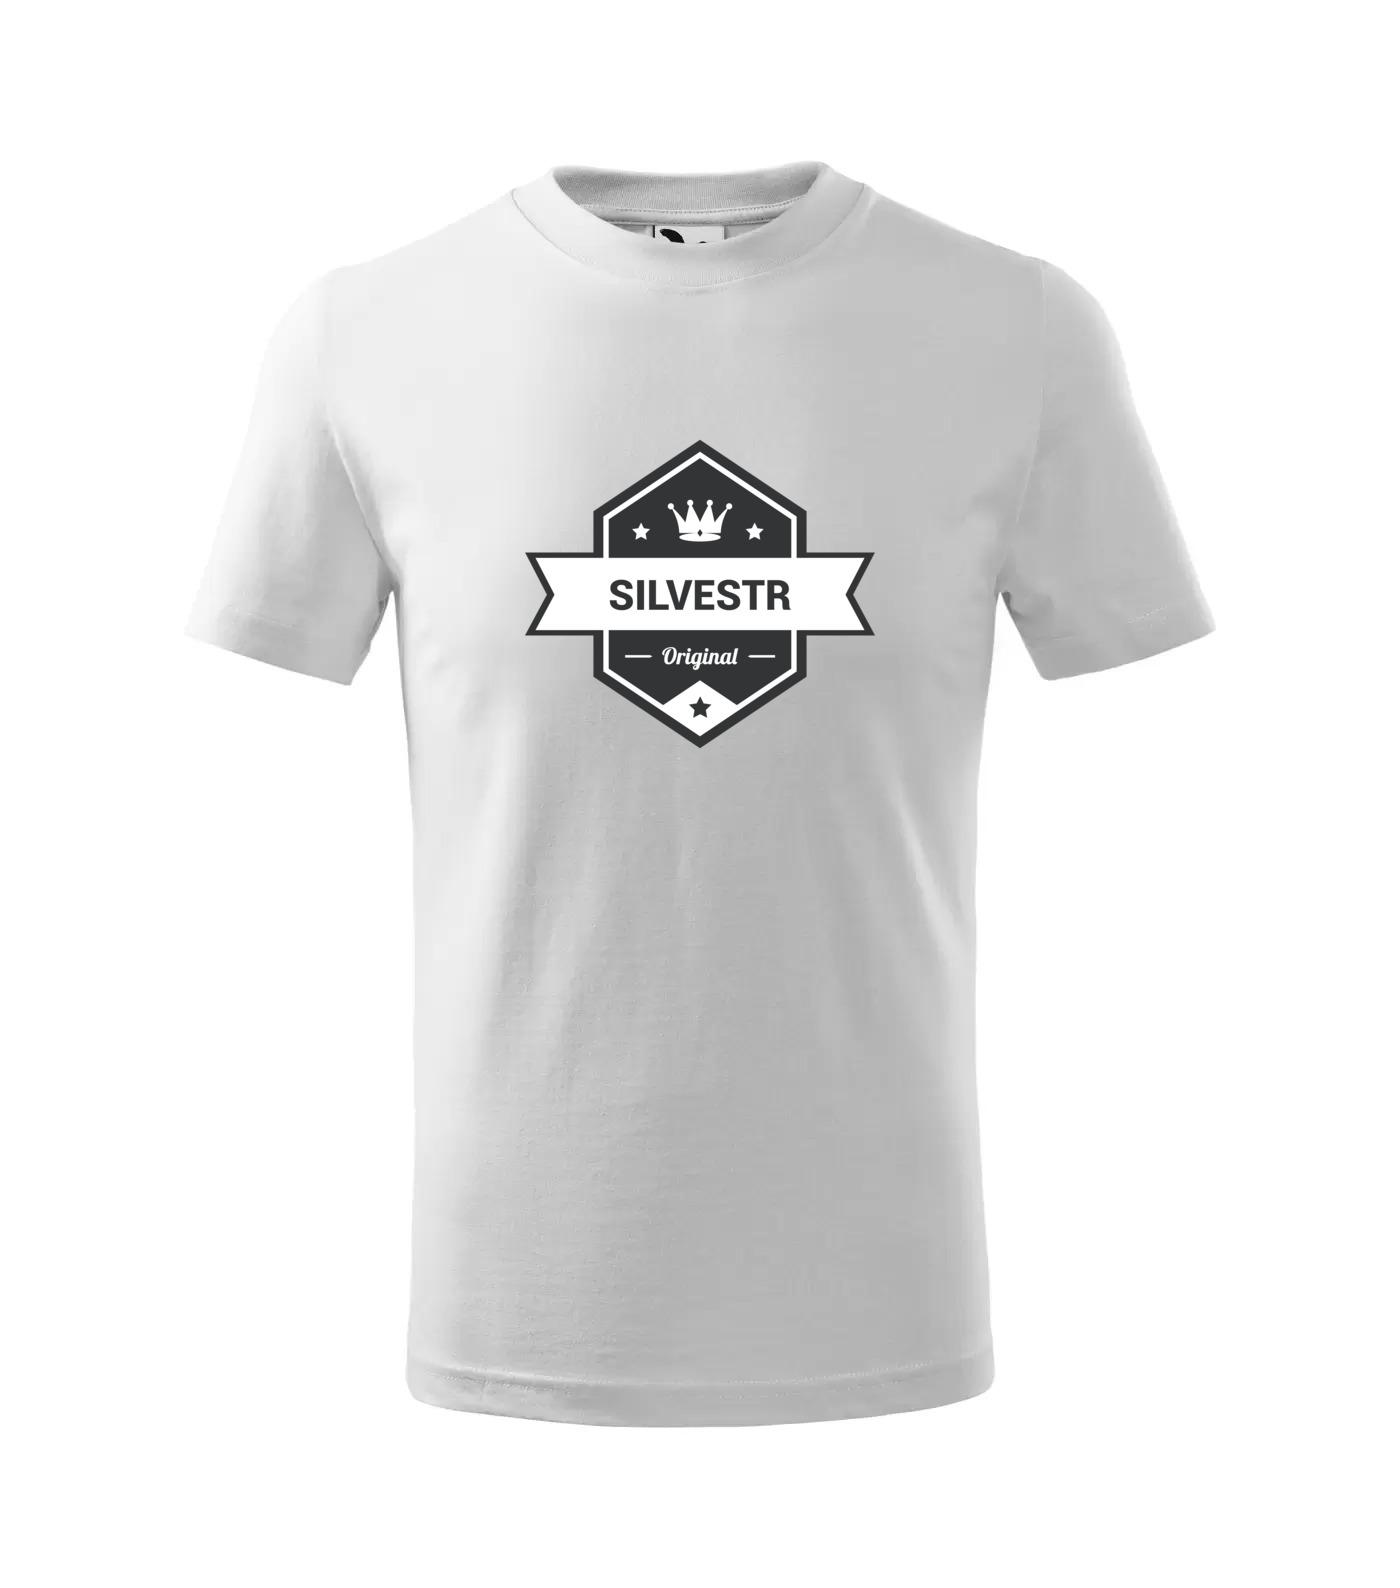 Tričko King Silvestr